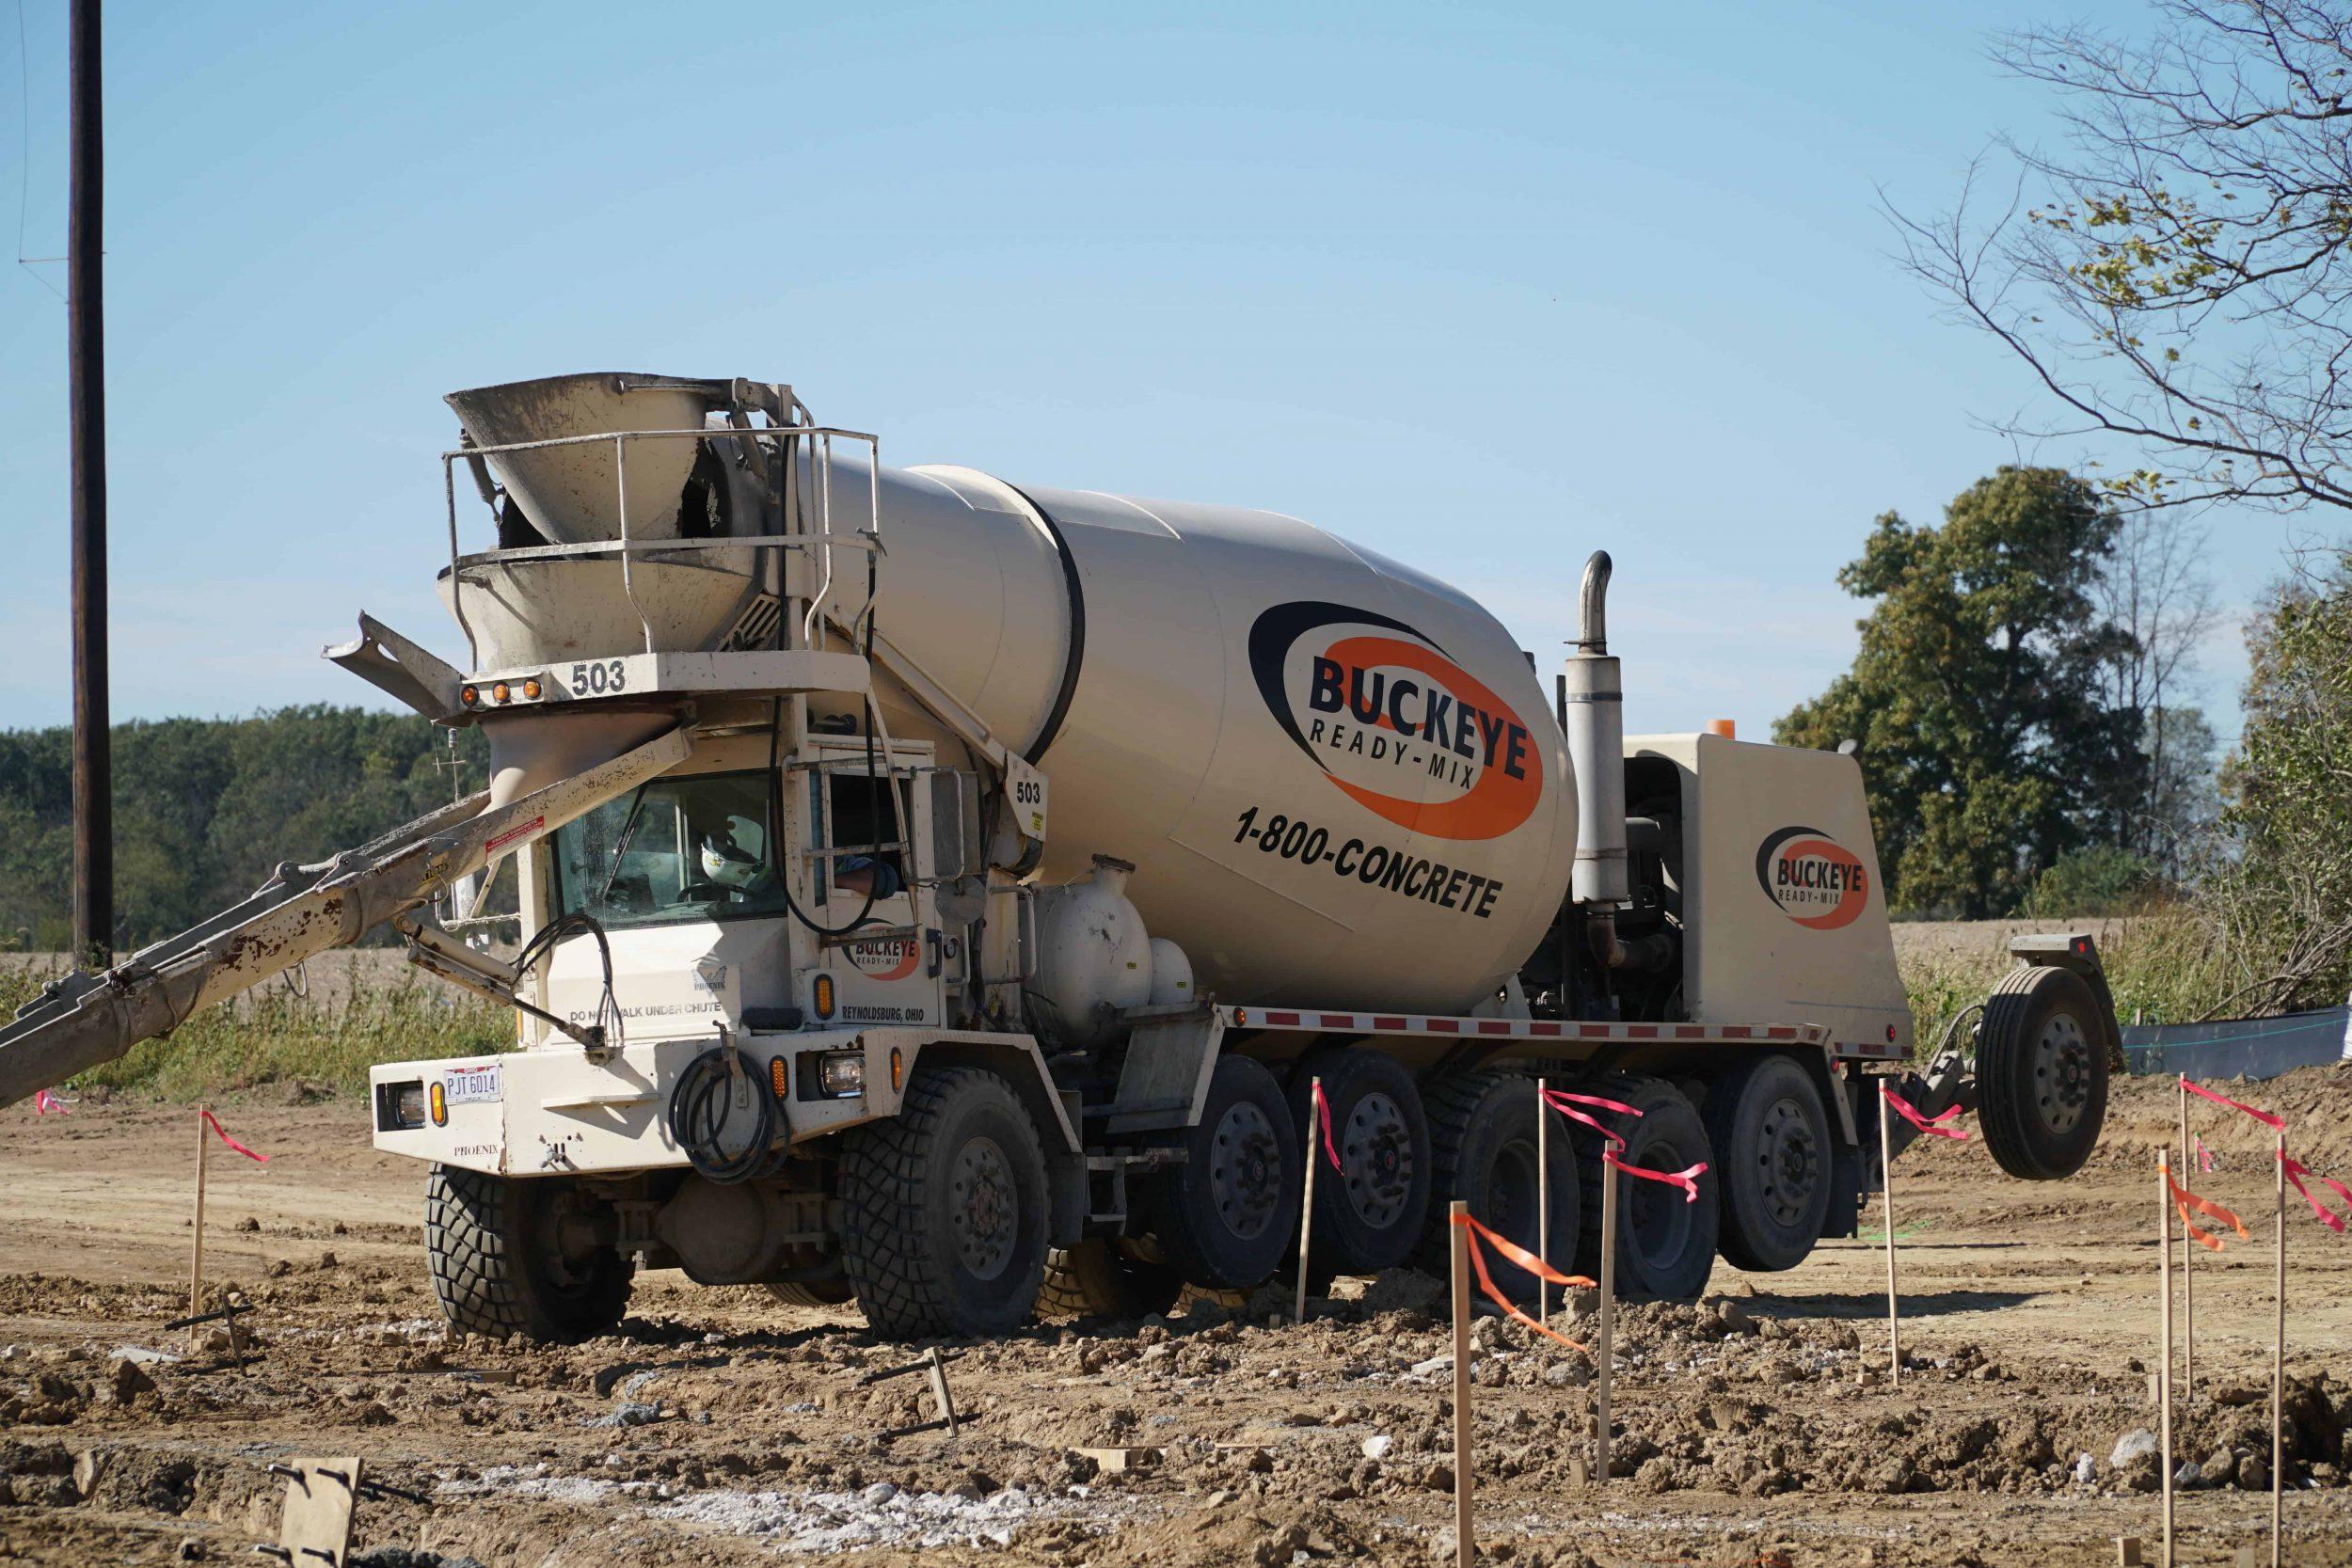 1-800-CONCRETE | BUCKEYE READY MIX ON NEW SCHOOL CONSTRUCTION SITE